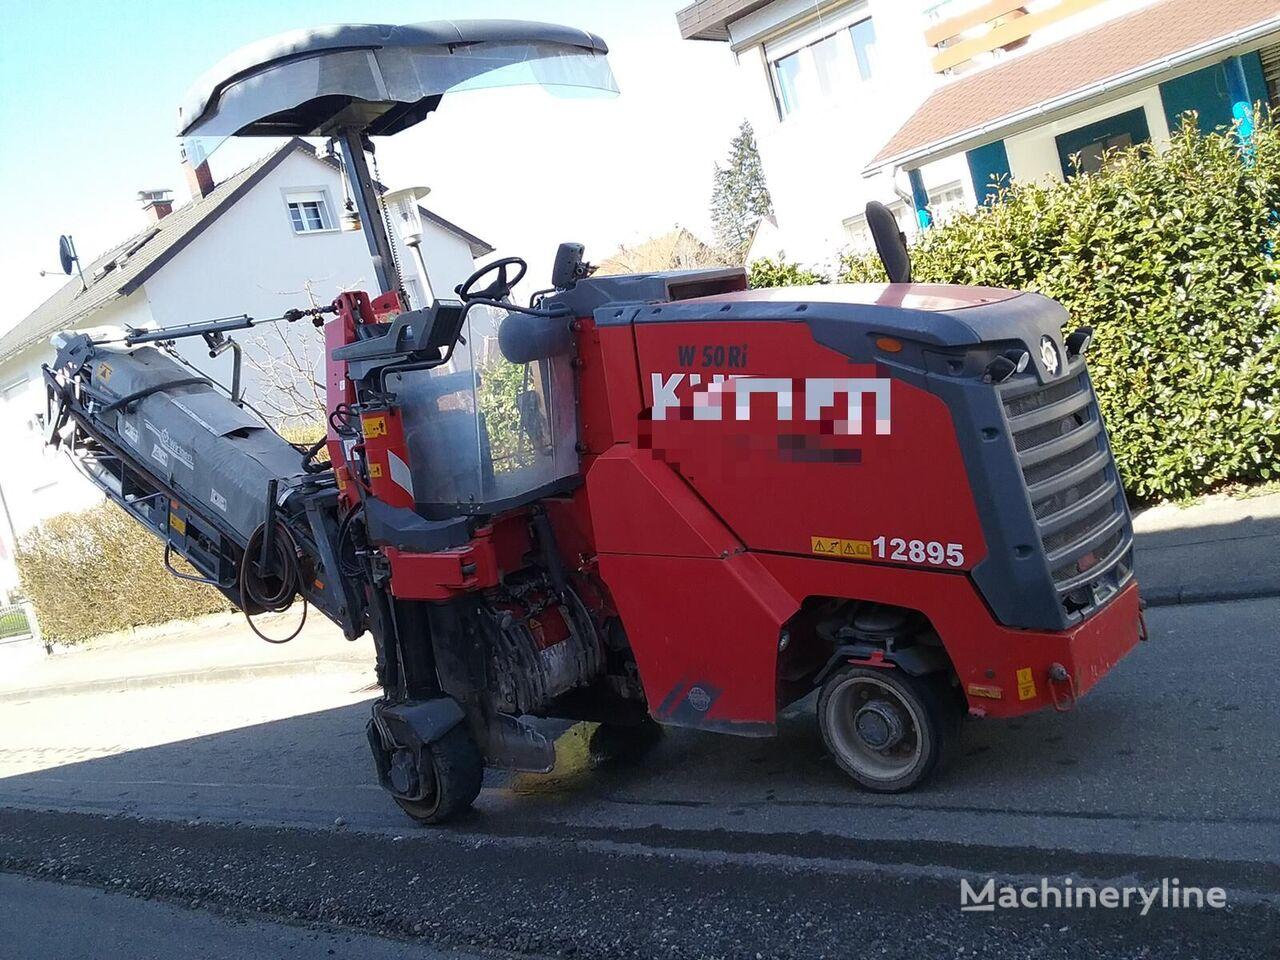 WIRTGEN W50ri asphalt milling machine